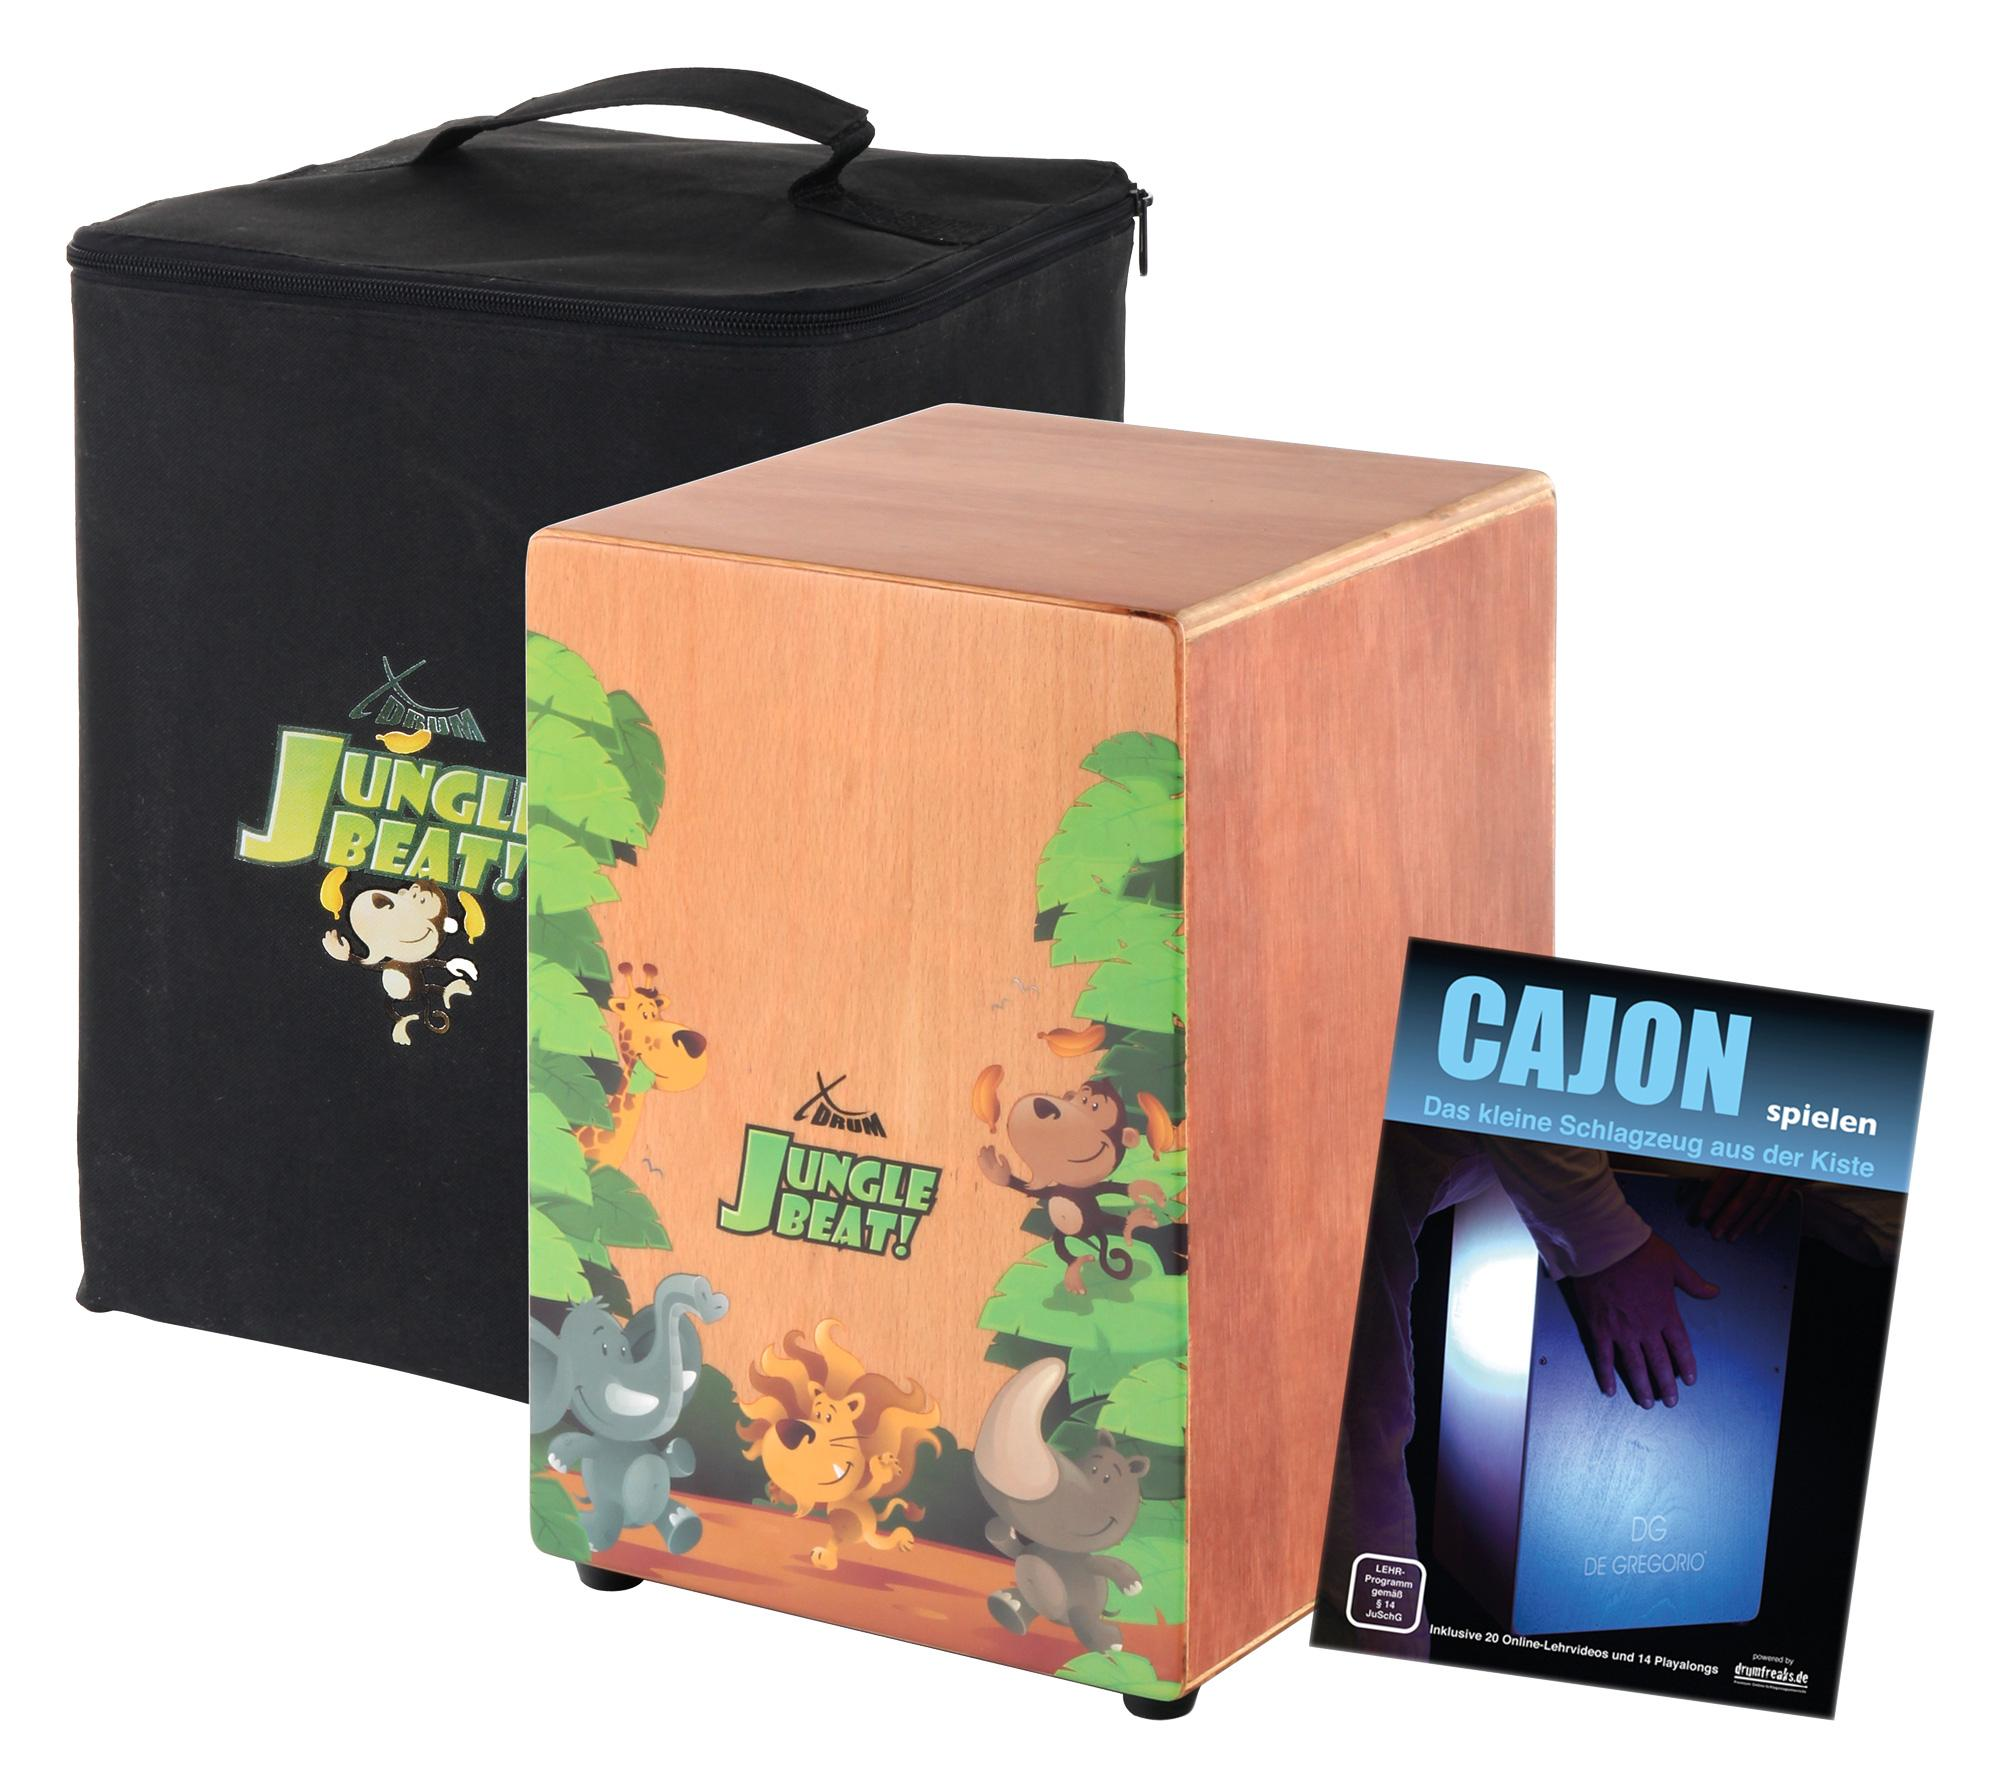 xdrum jungle beat kinder cajon set inkl tasche bungsheft und cd. Black Bedroom Furniture Sets. Home Design Ideas